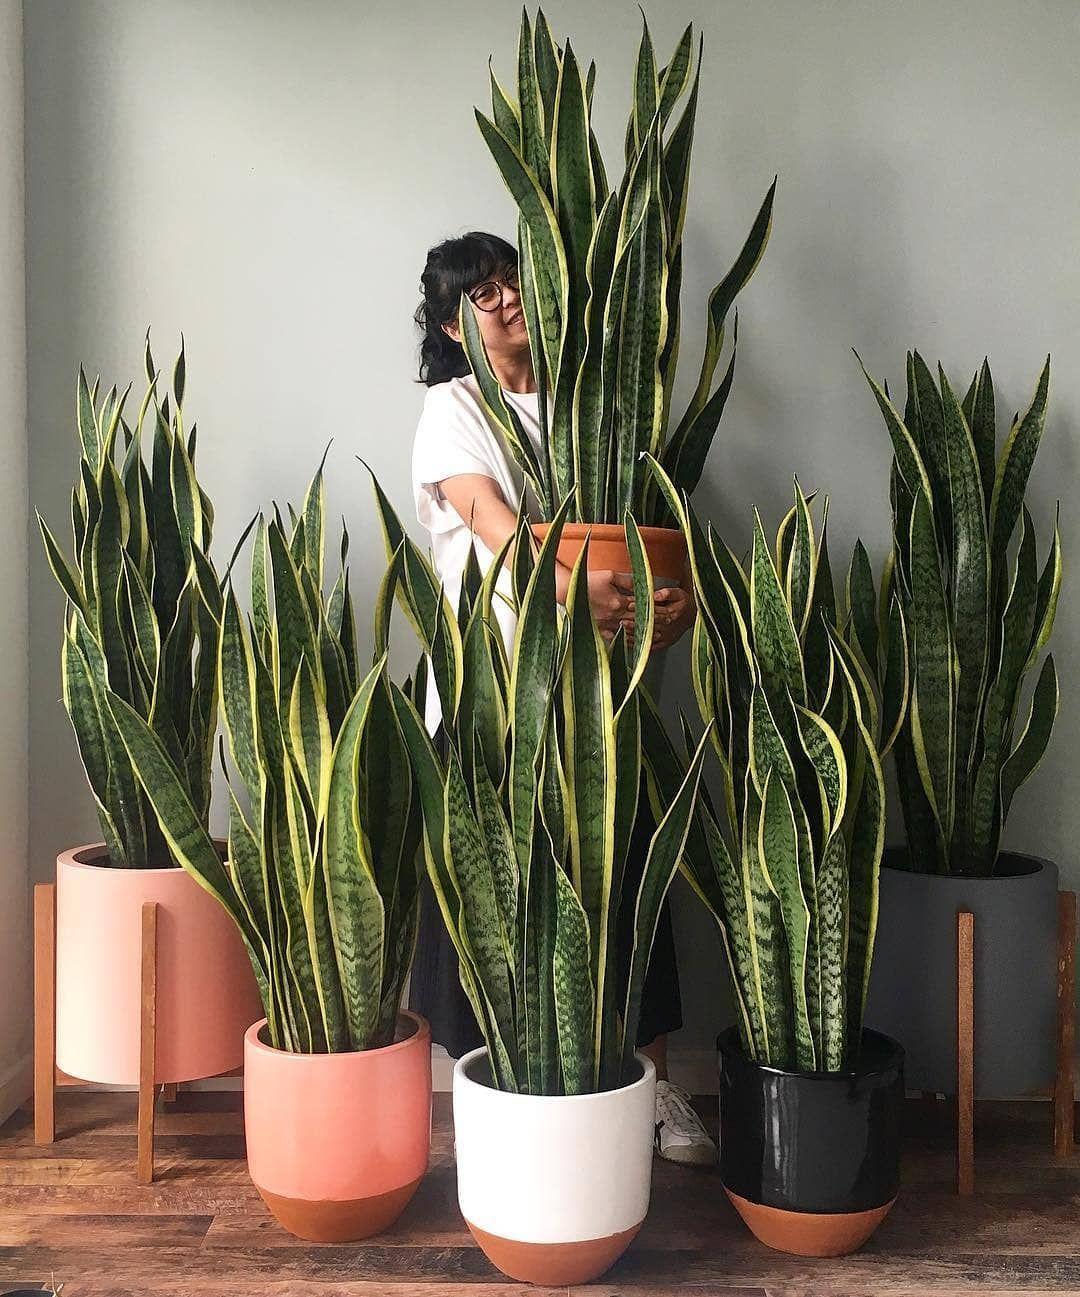 Olivra Homedecor On Instagram Snake Plant Family Tag A Friend